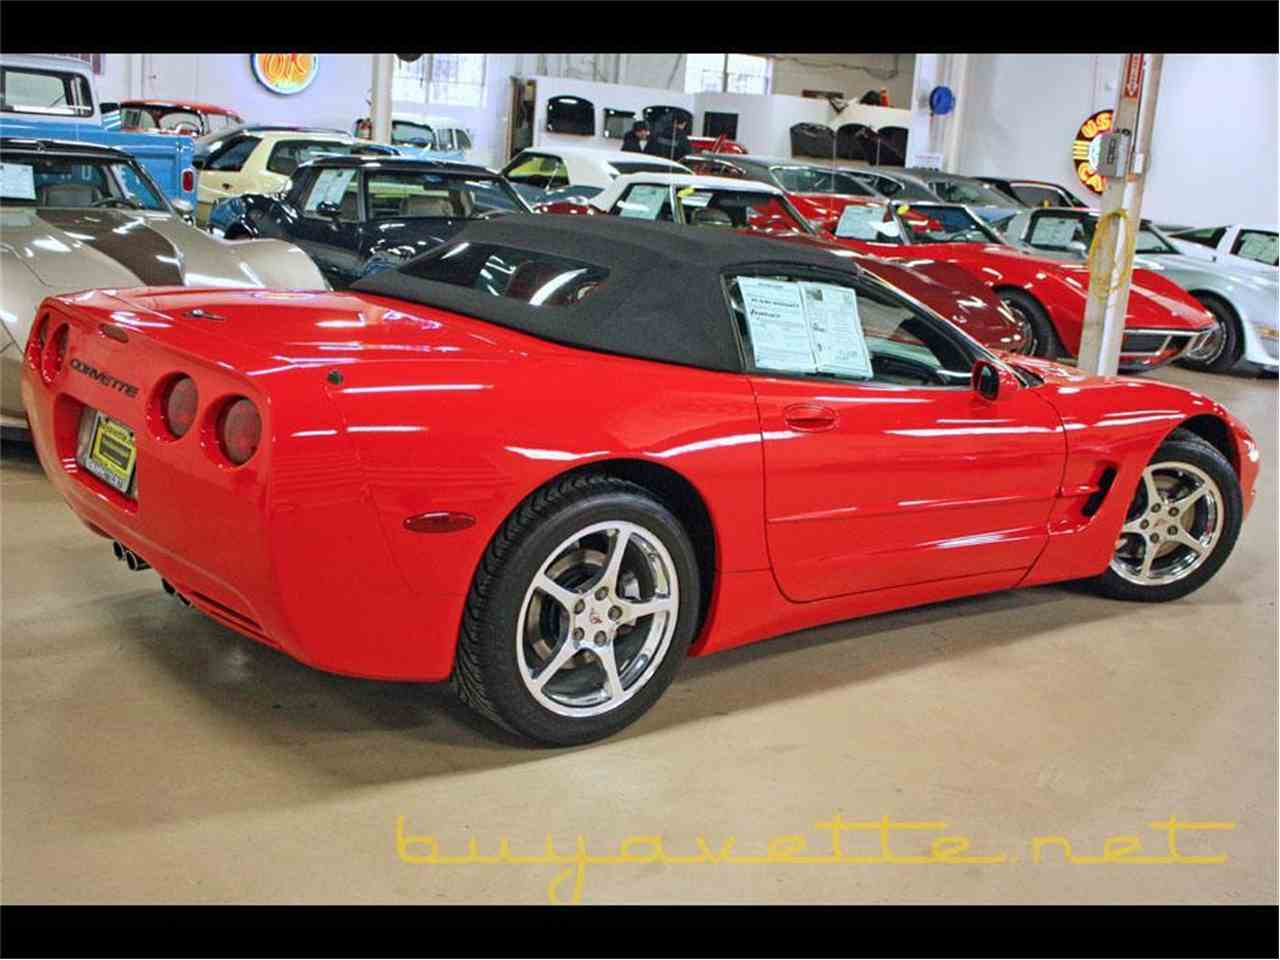 Large Picture of 2002 Chevrolet Corvette located in Atlanta Georgia - $16,999.00 - MFOA